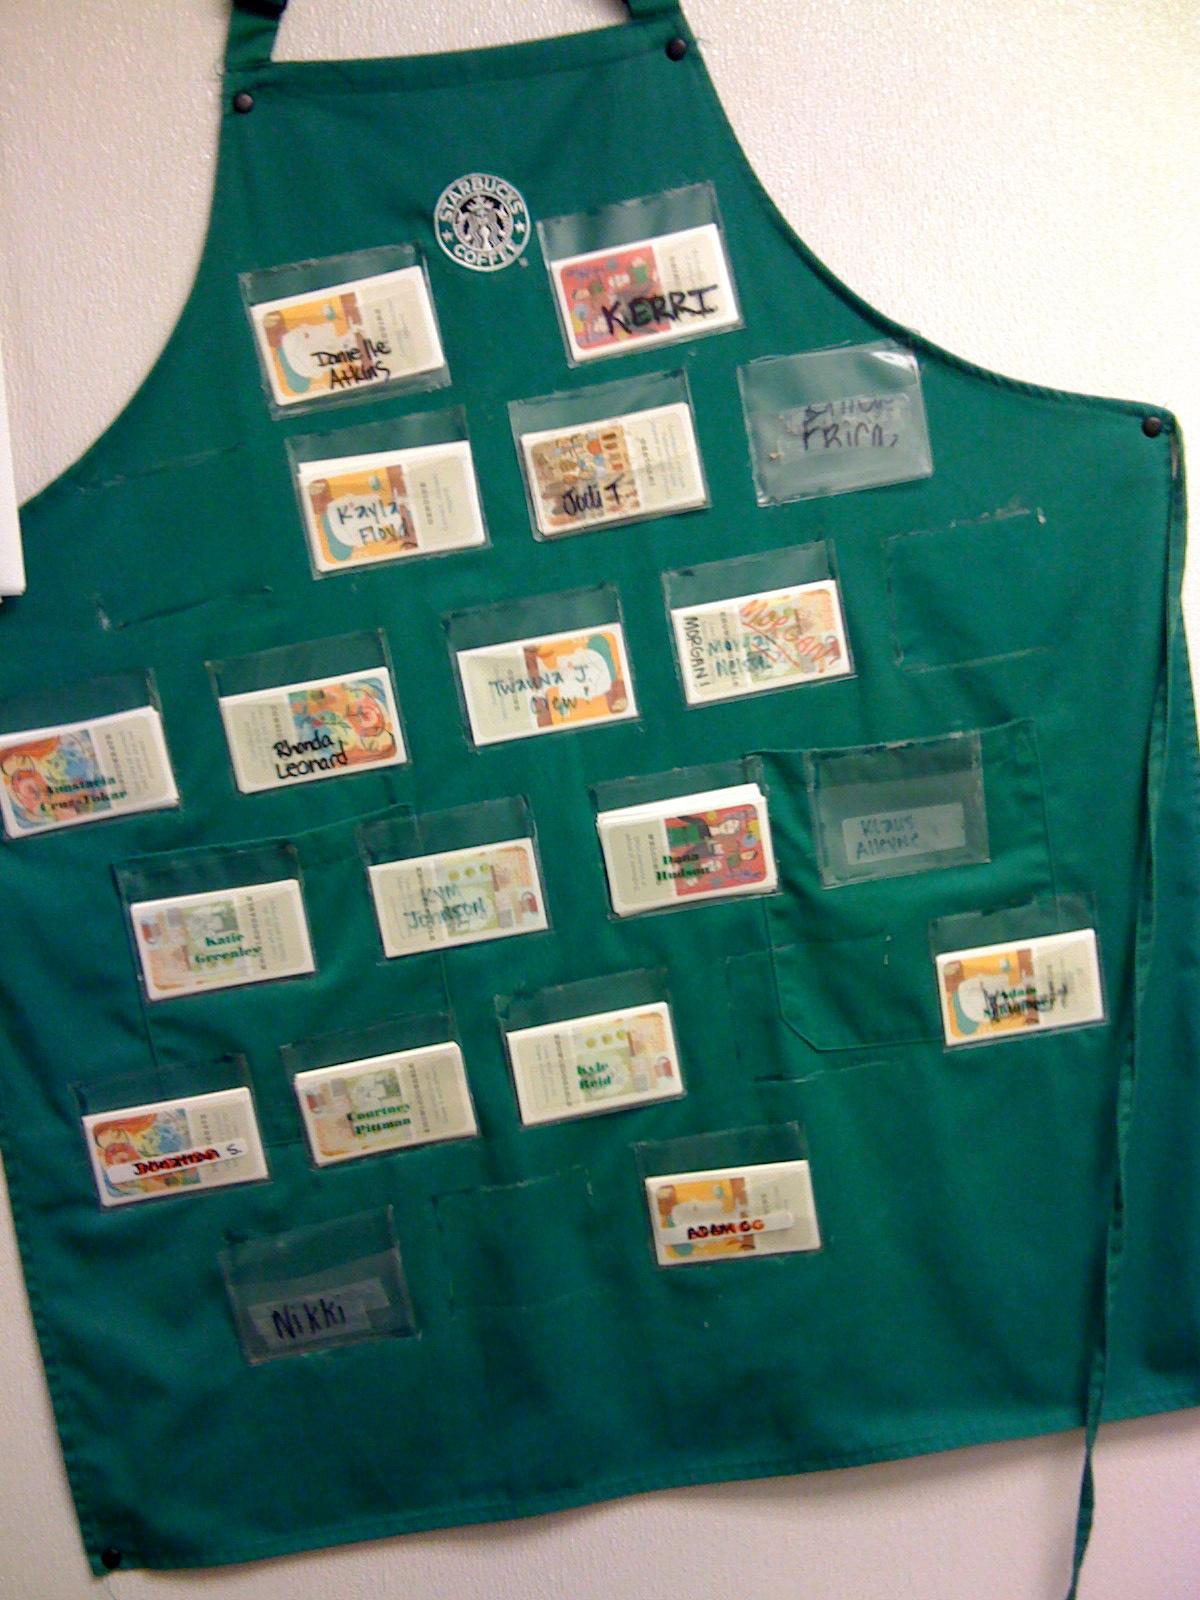 the green apron blah blah blog rh starbucksgirl wordpress com Seattle Starbucks Cup Starbucks Drink Carrier